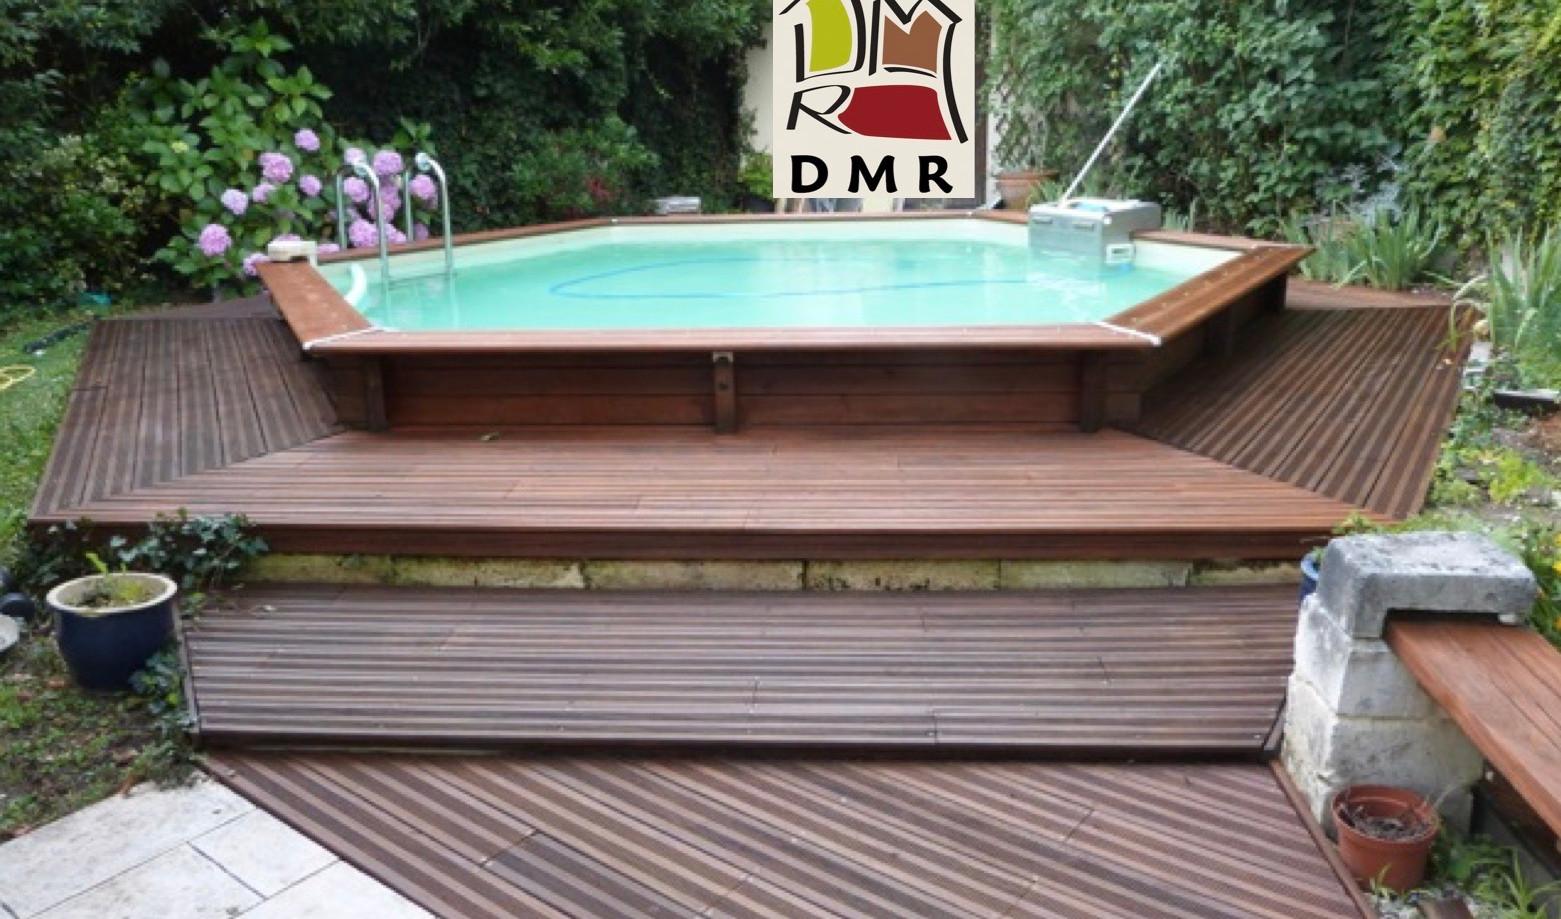 Terrasse_piscine_cailleboti_cumaru_DMR_RÉNOVATION